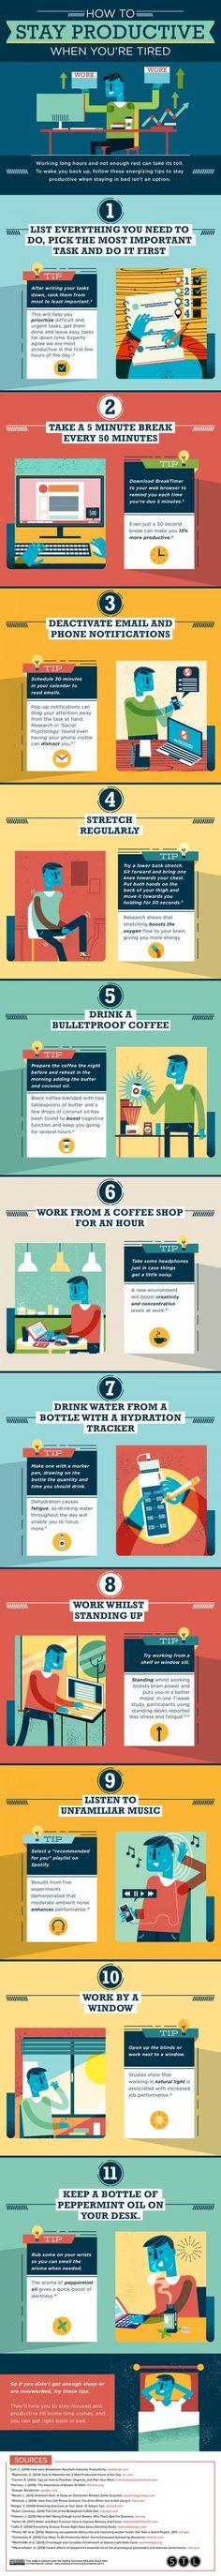 Work productive #thinkproductive